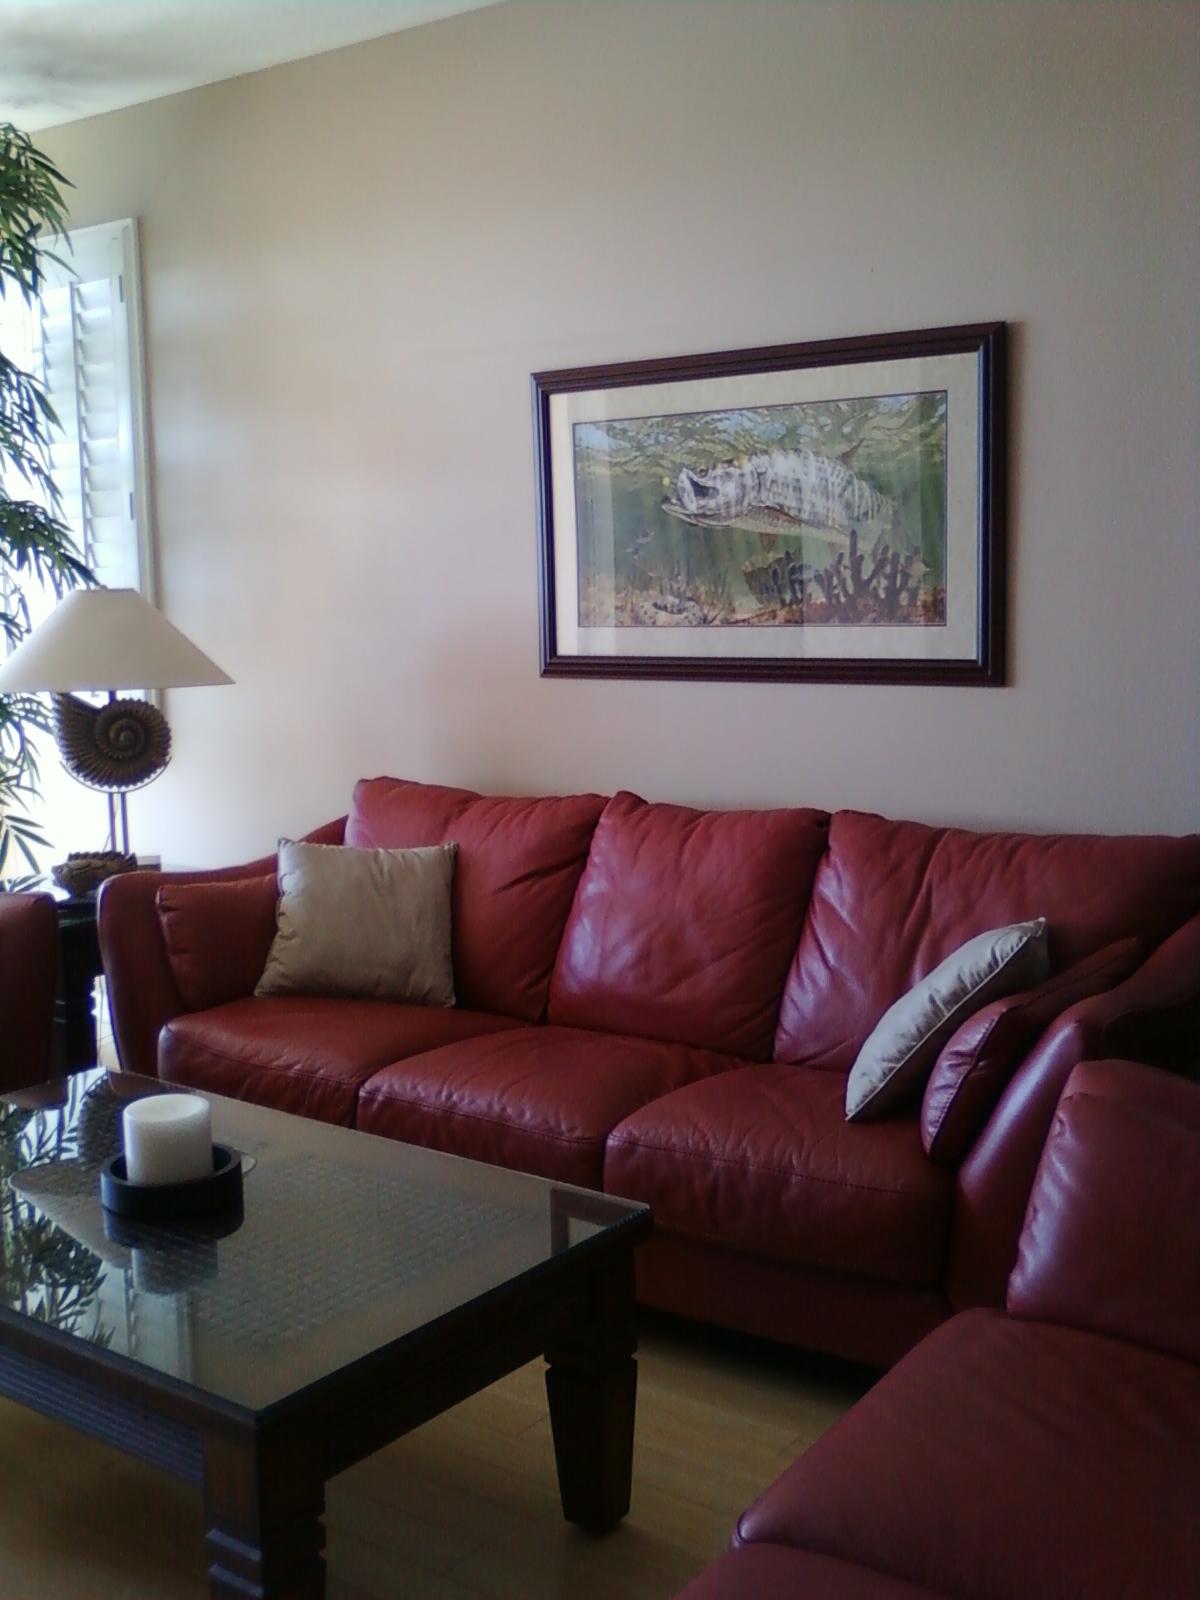 Experience the Boca Grande area in style